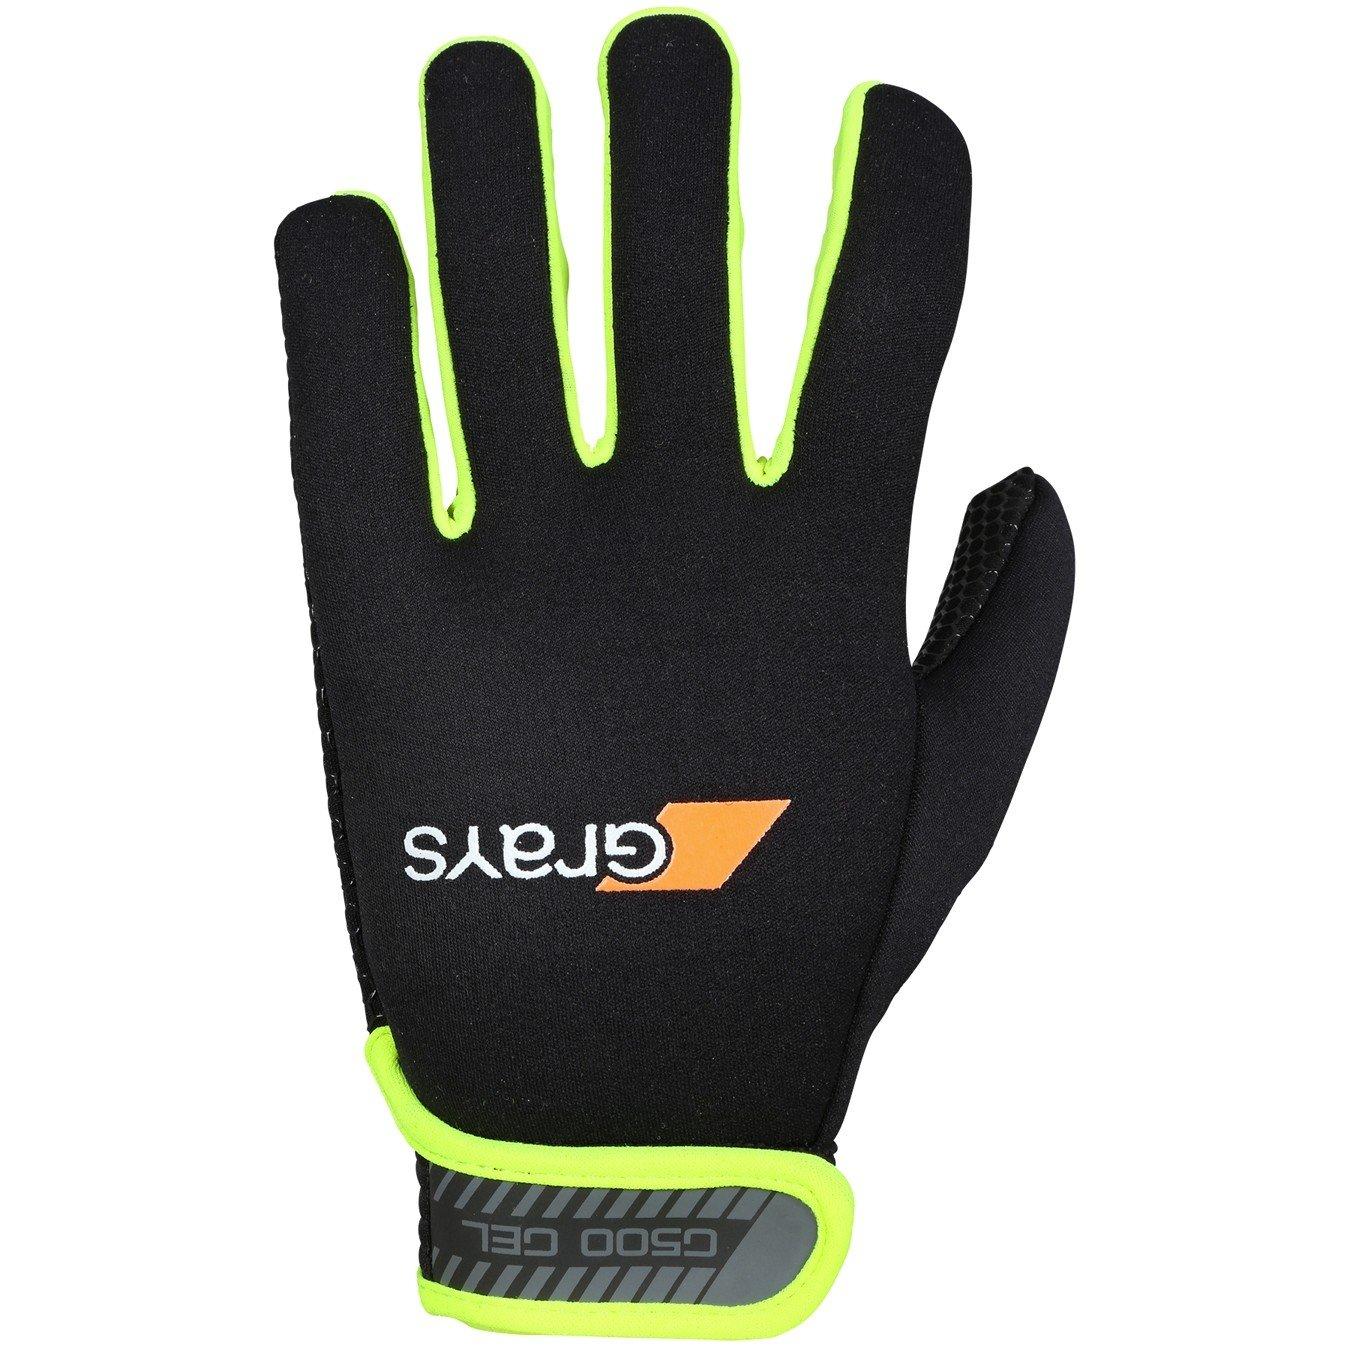 Grays G500 Gel Gloves (Black/Fluo Yellow)